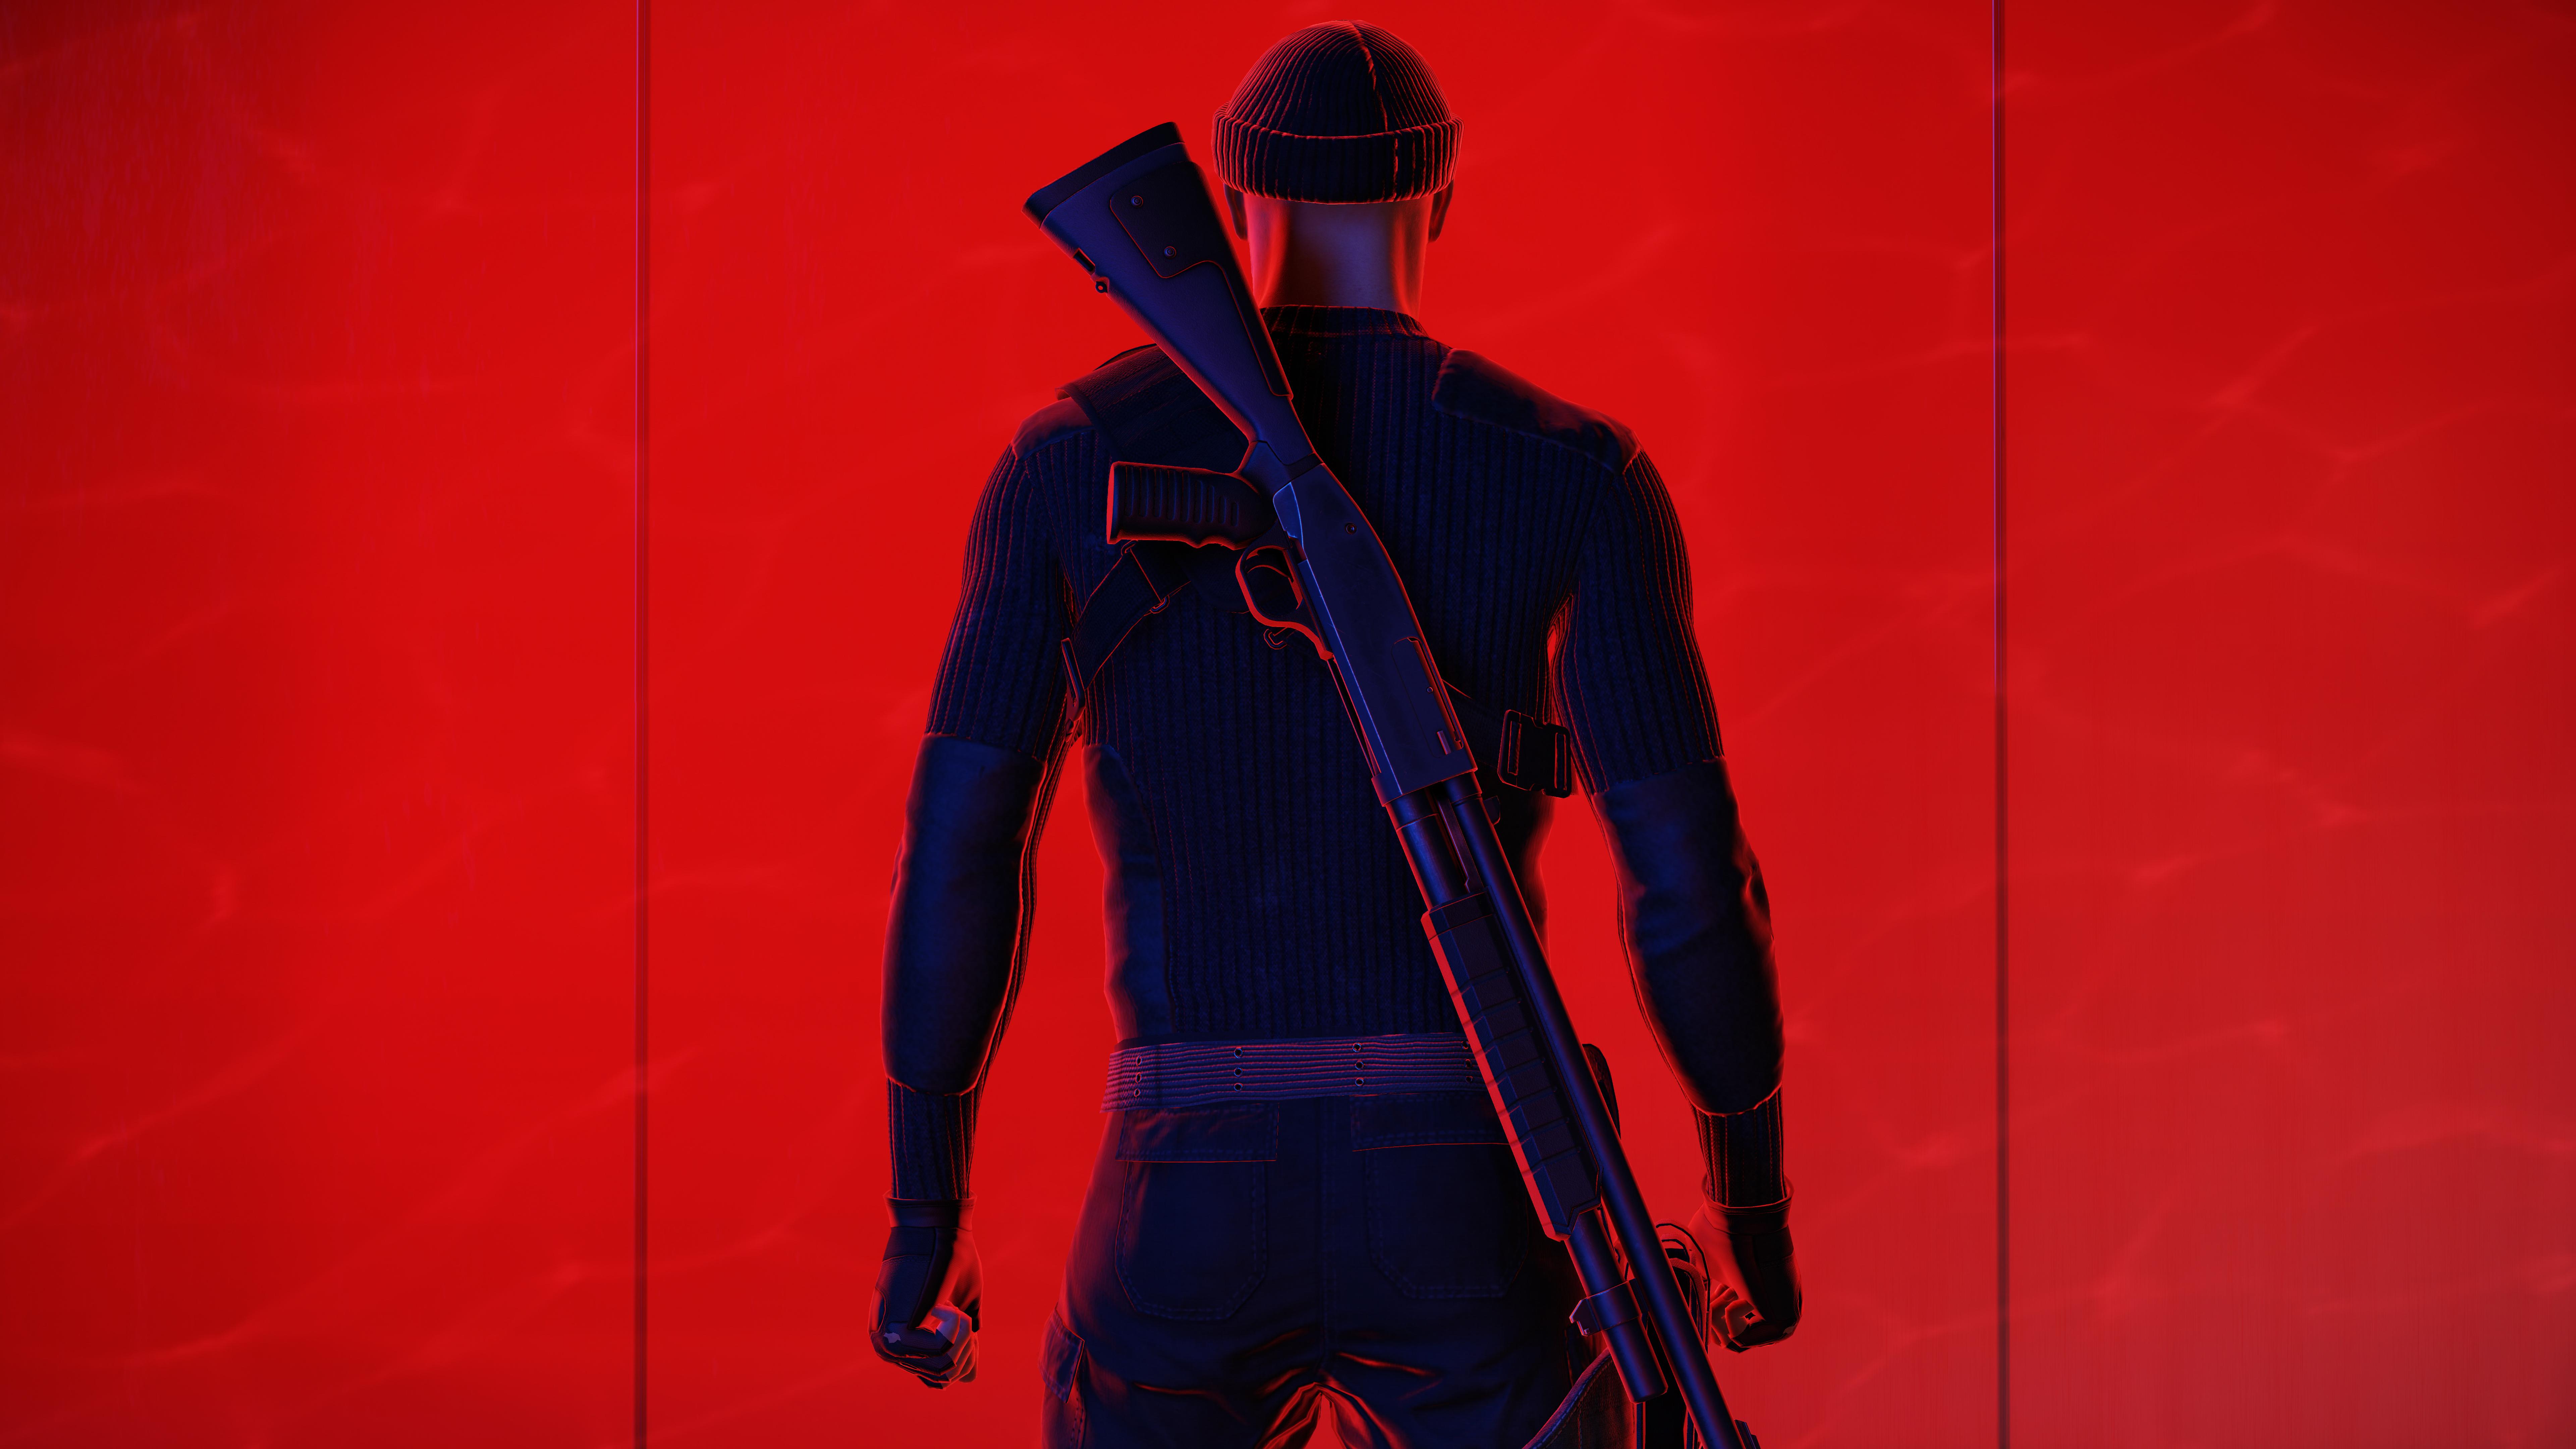 7680x4320 Agent 47 Hitman 2 8k Wallpaper Hd Games 4k